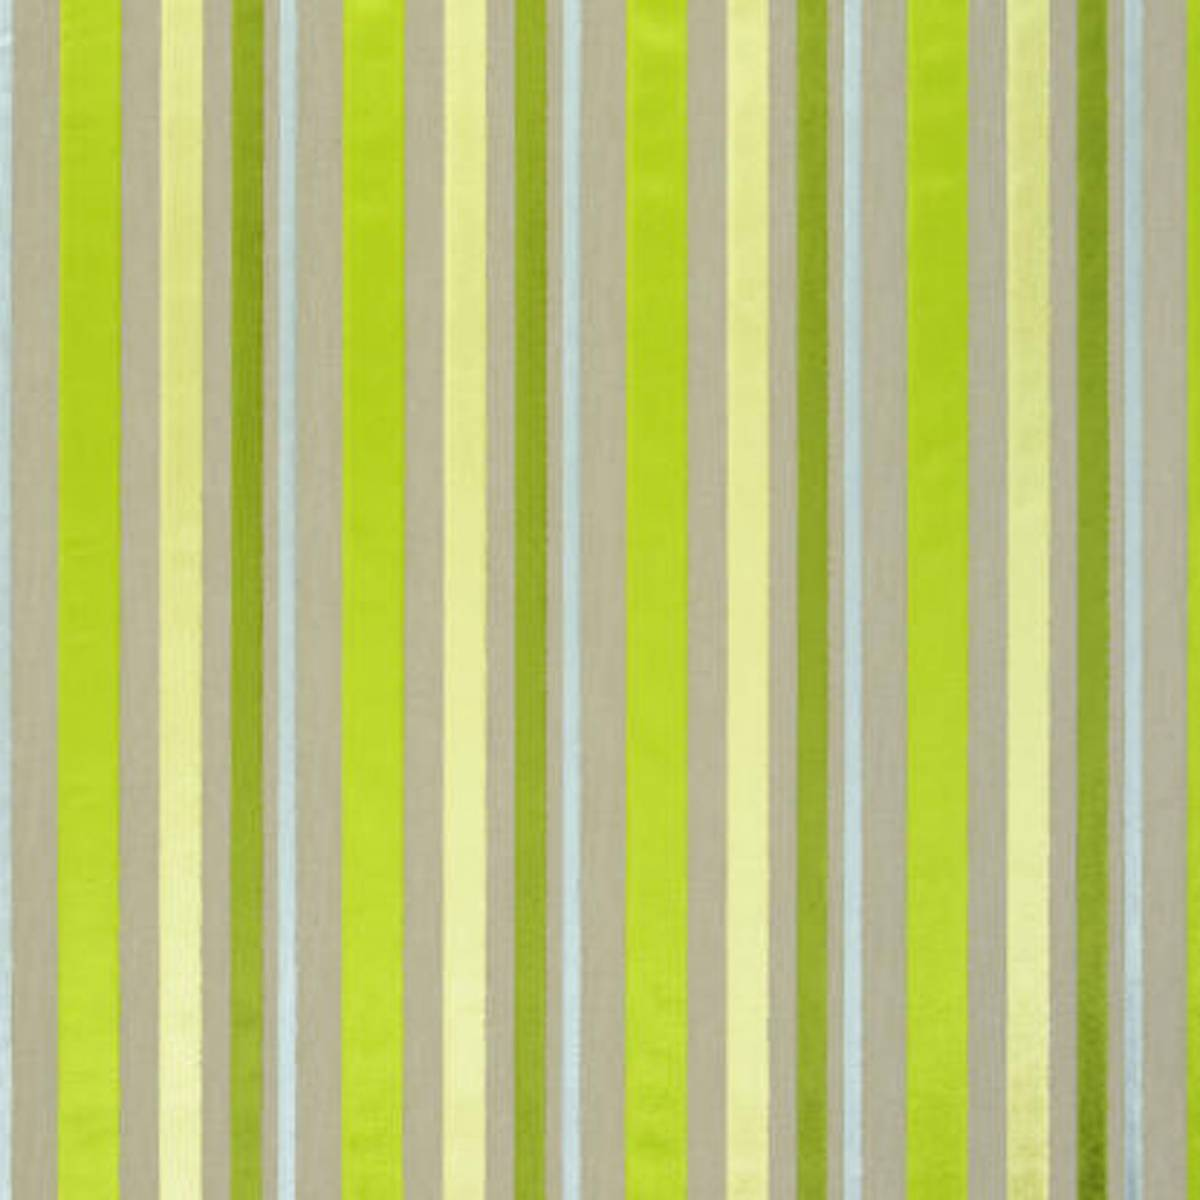 Trasimeno Fabric Lime F1170 11 Designers Guild